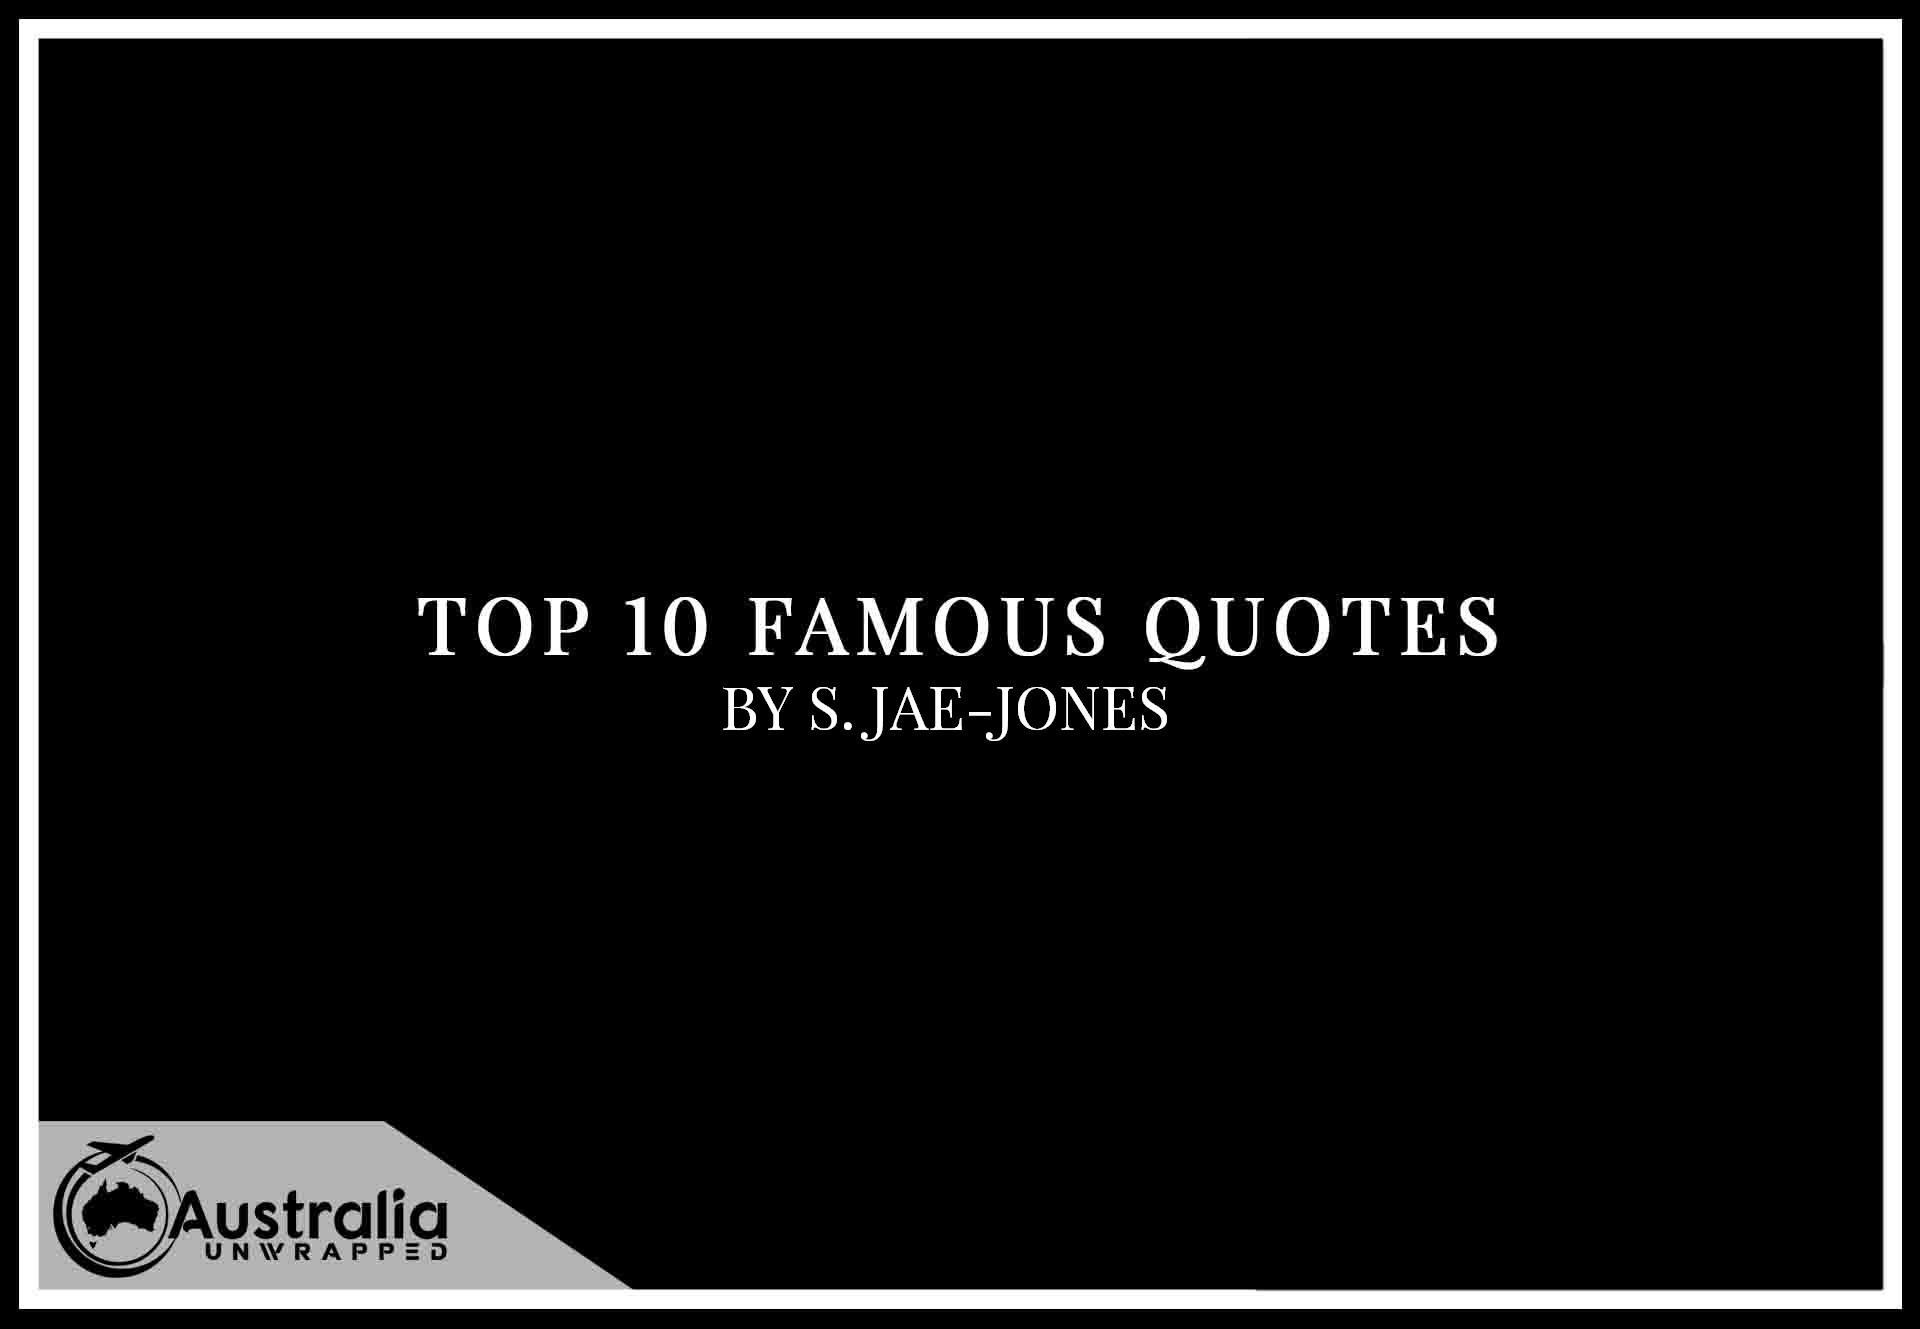 Top 10 Famous Quotes by Author S. Jae-Jones